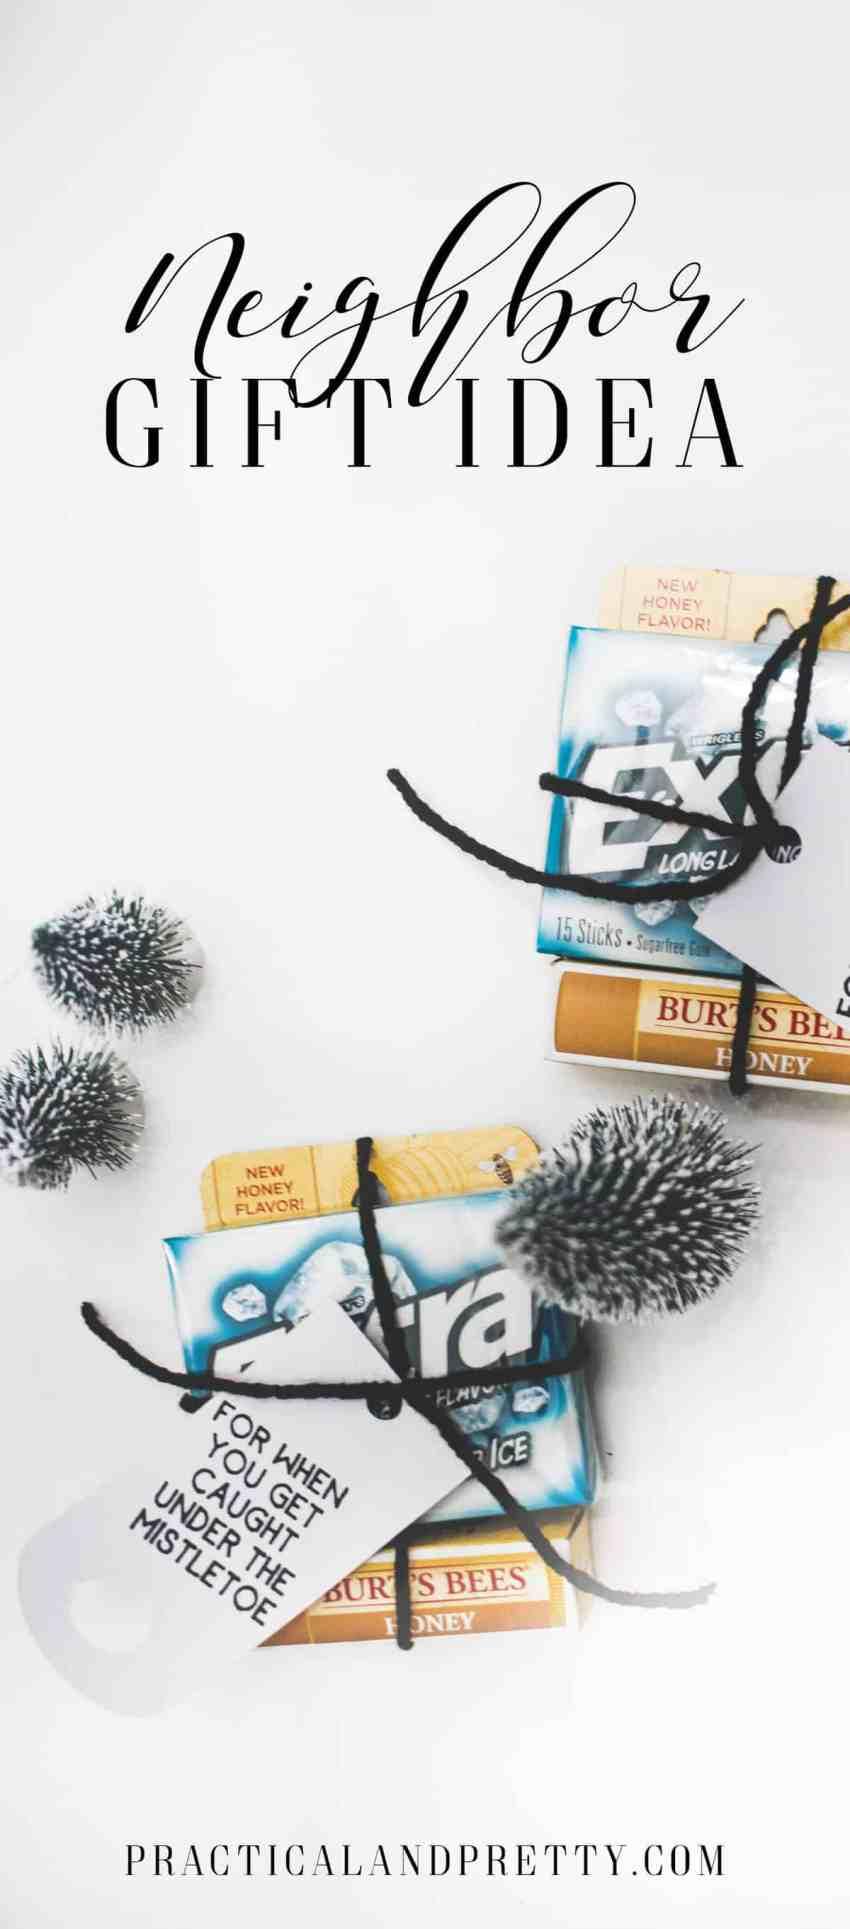 Mistletoe Neighbor Gift Idea - for when you get caught under the mistletoe! | www.overthebigmoon.com